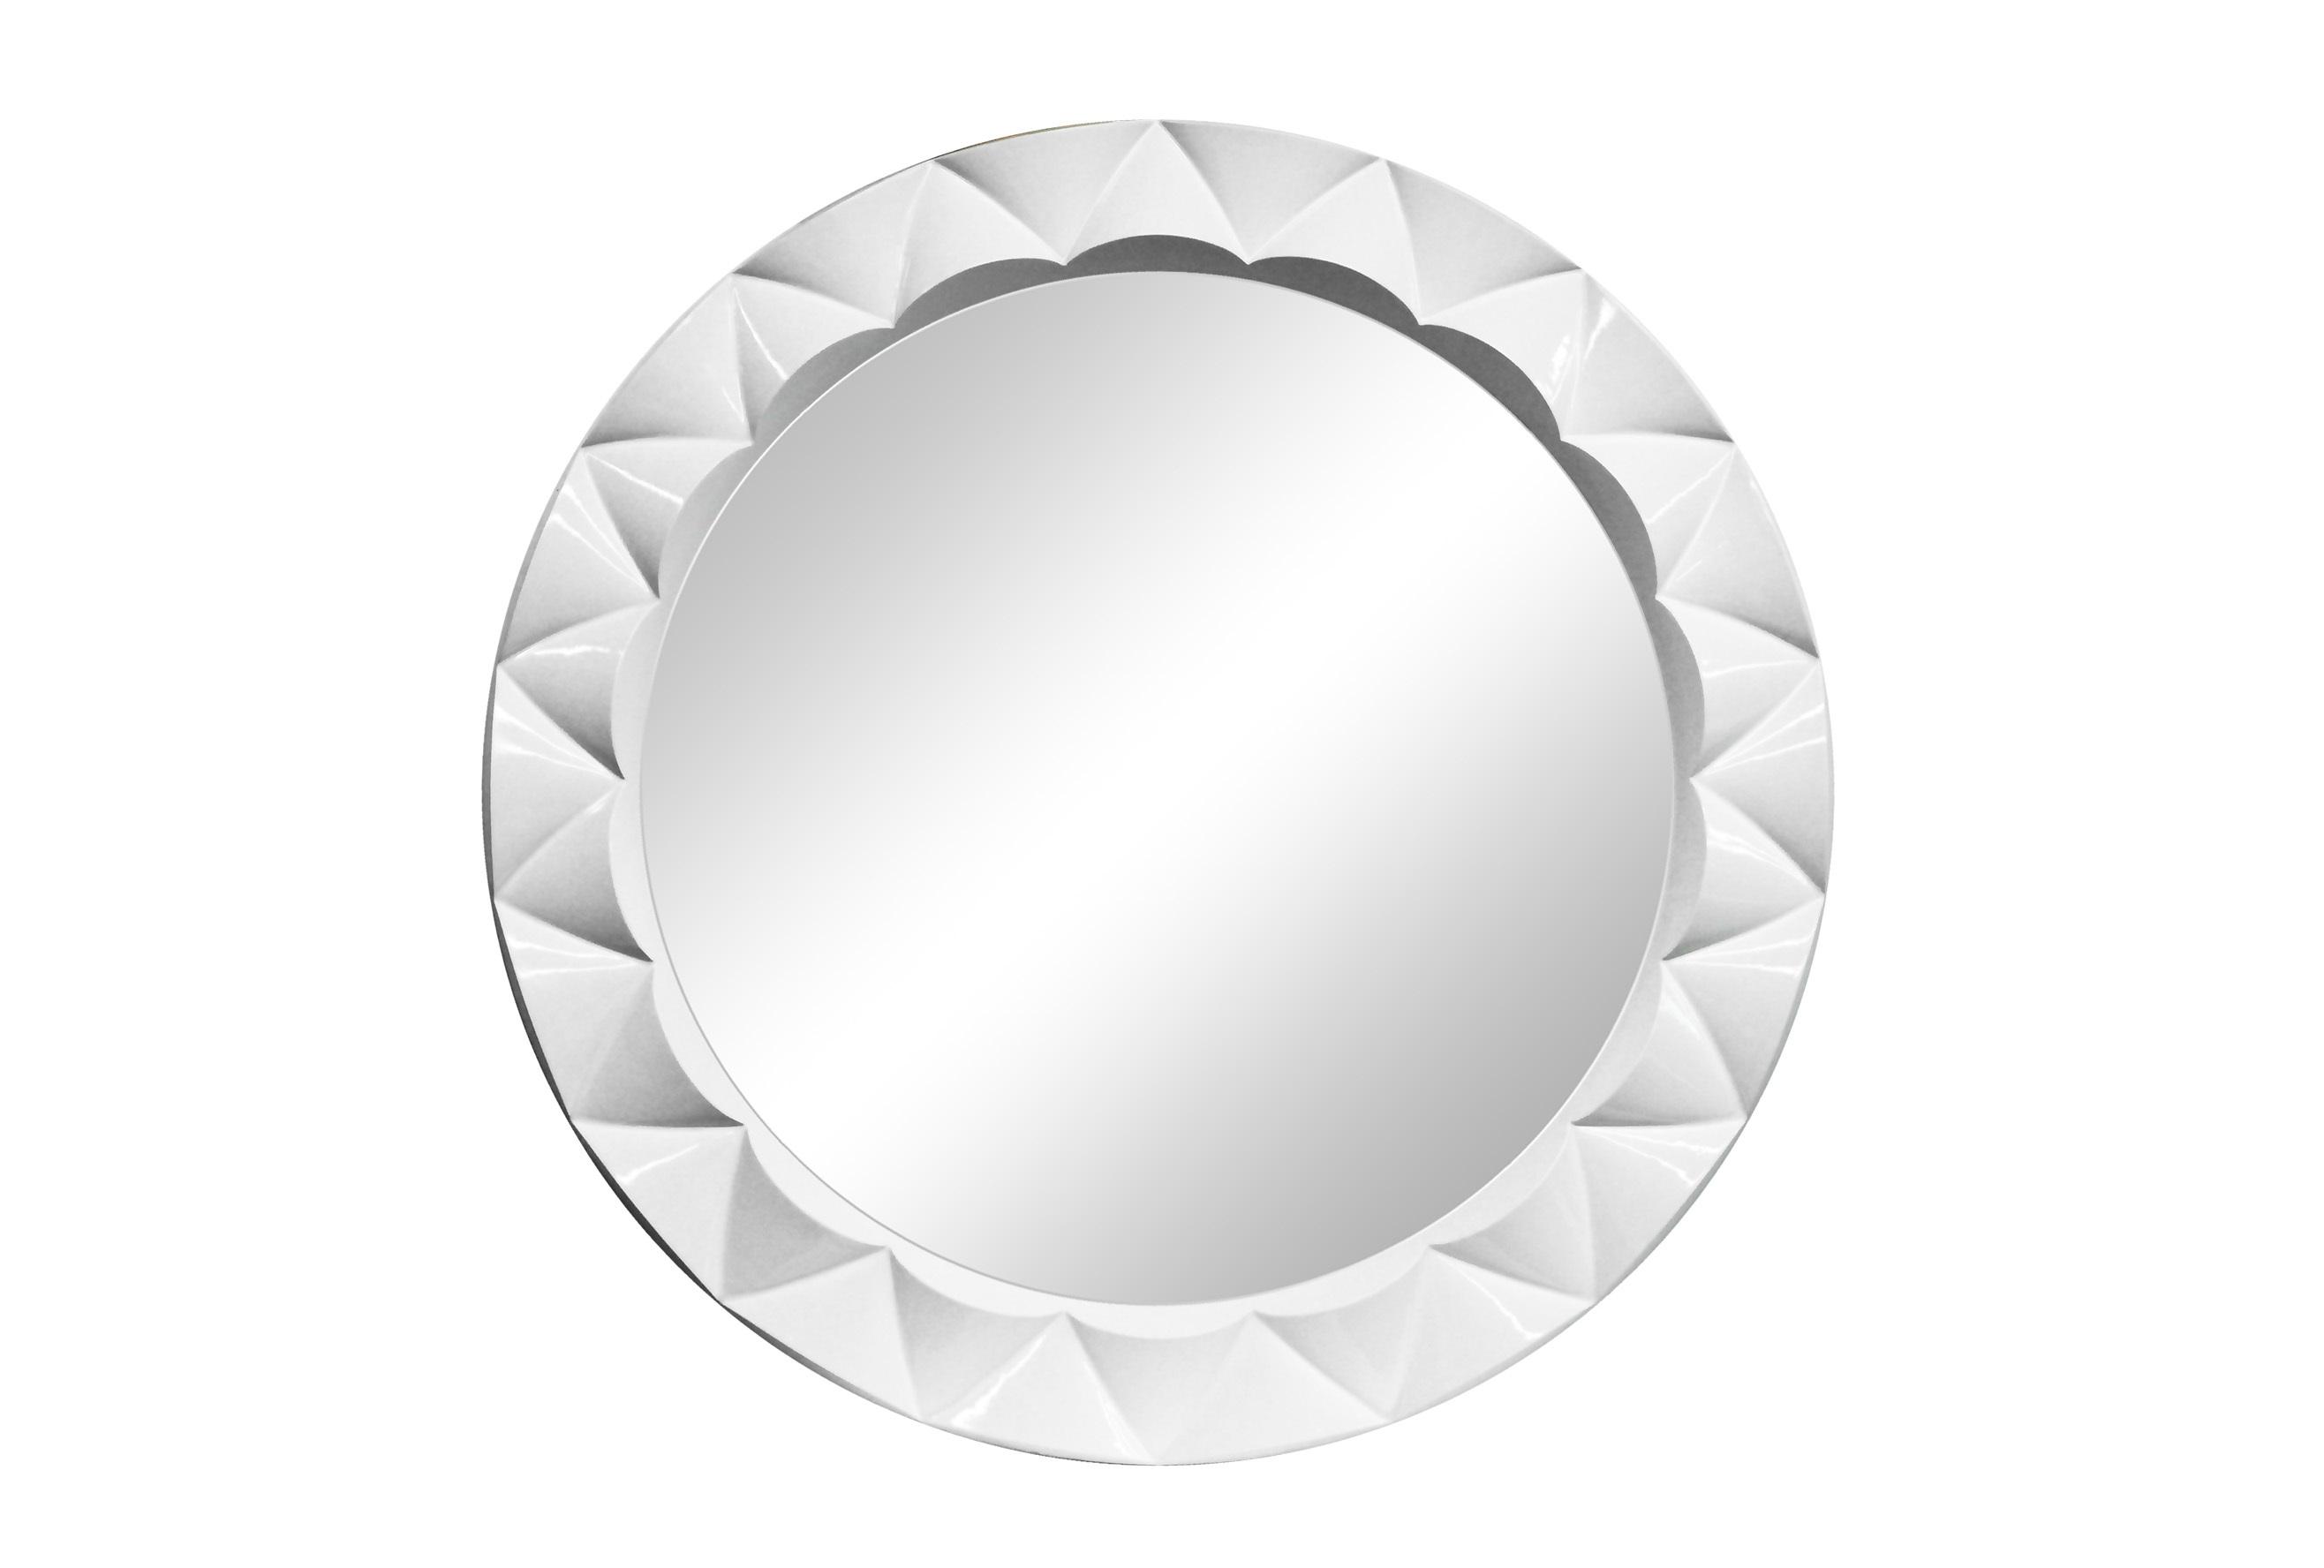 Зеркало Reeforma 15432716 от thefurnish